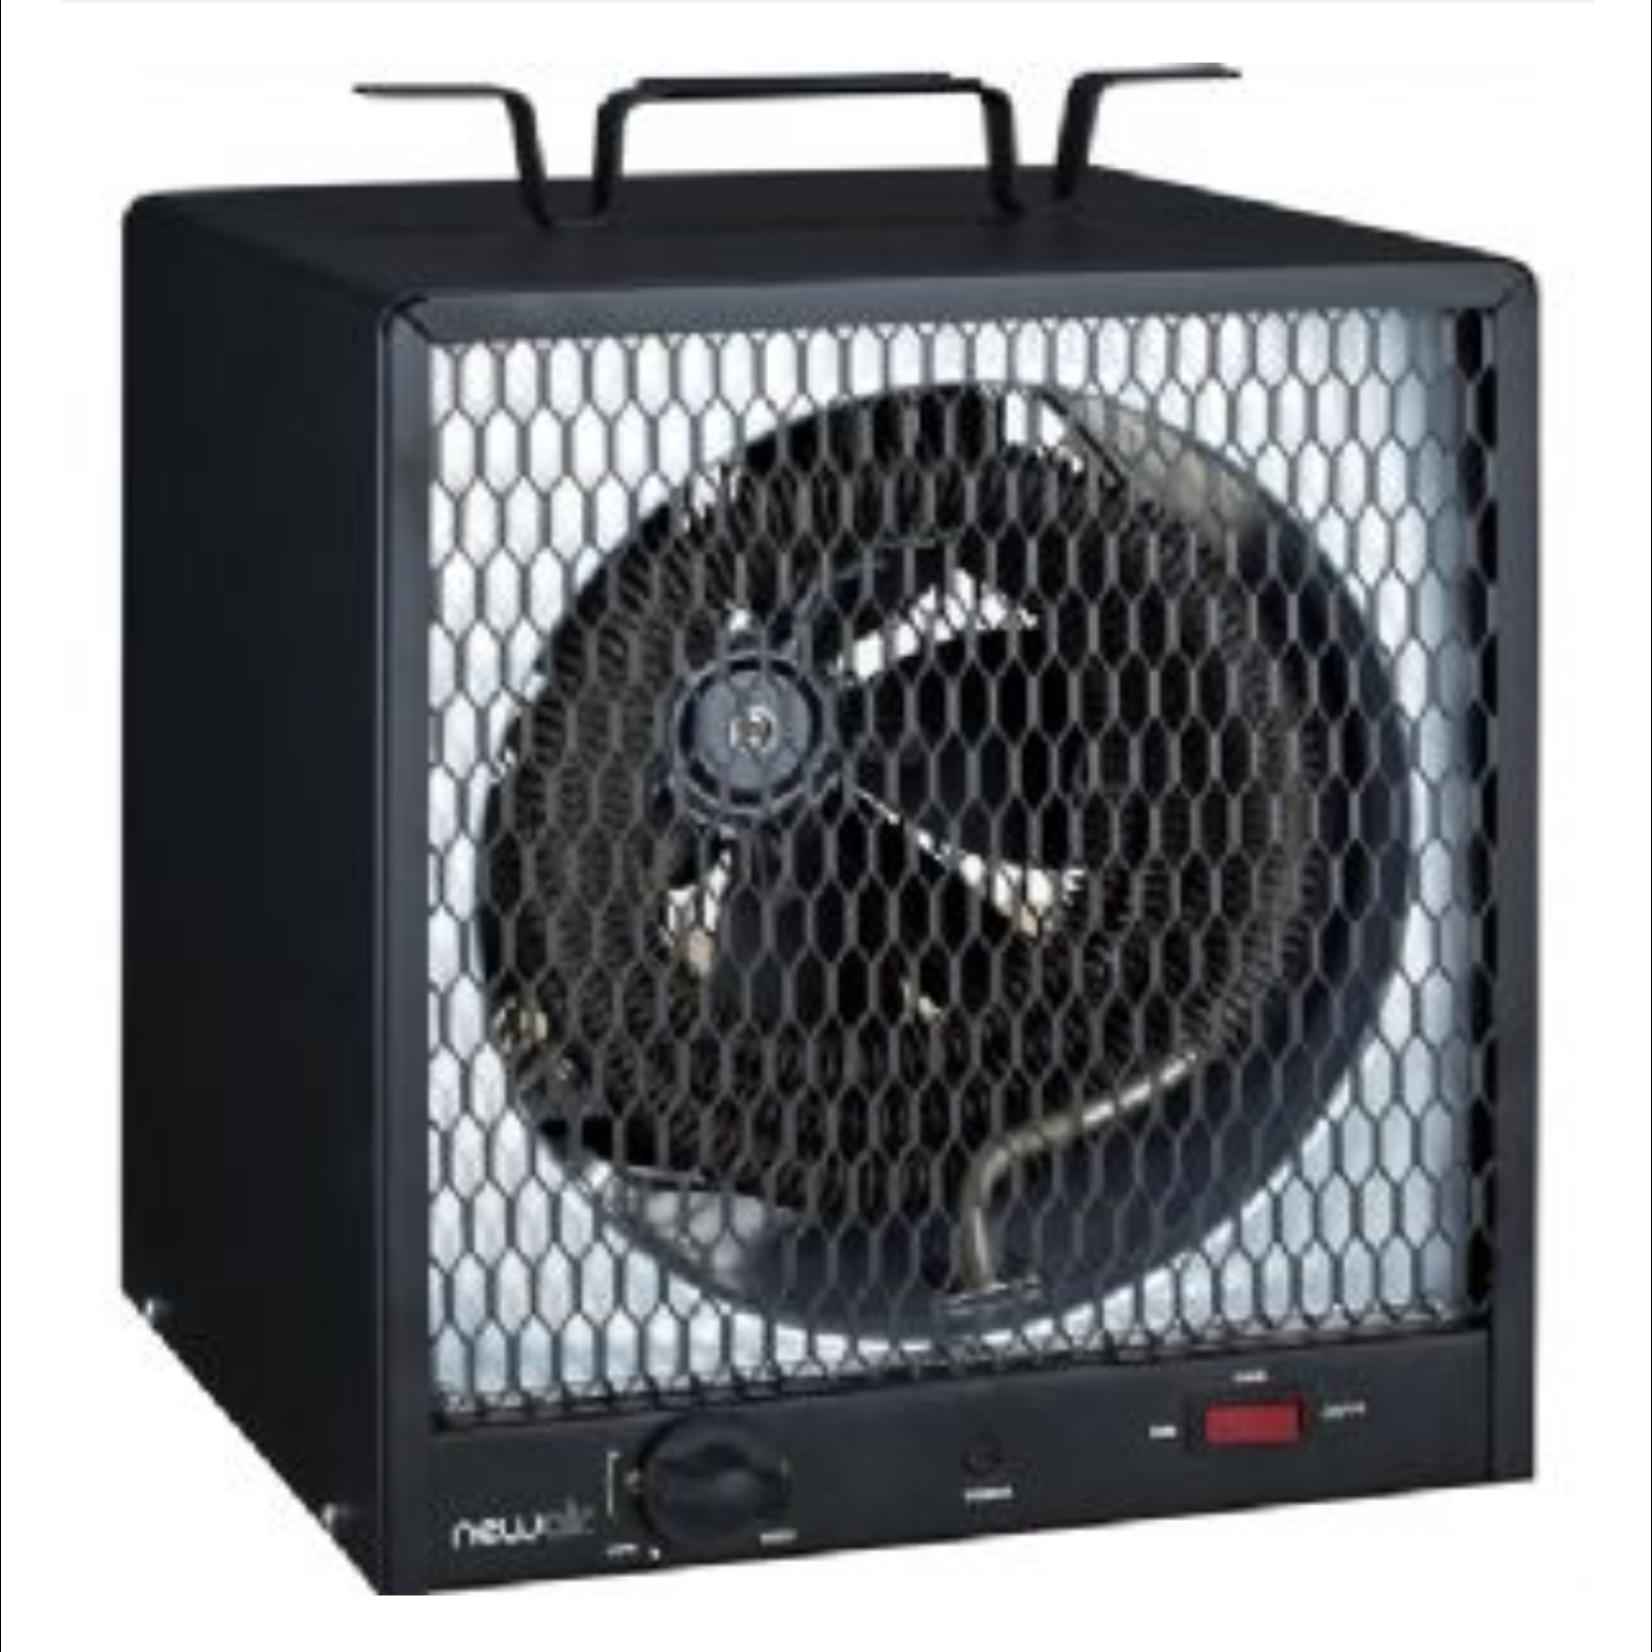 10520 Newair Portable Garage Heater